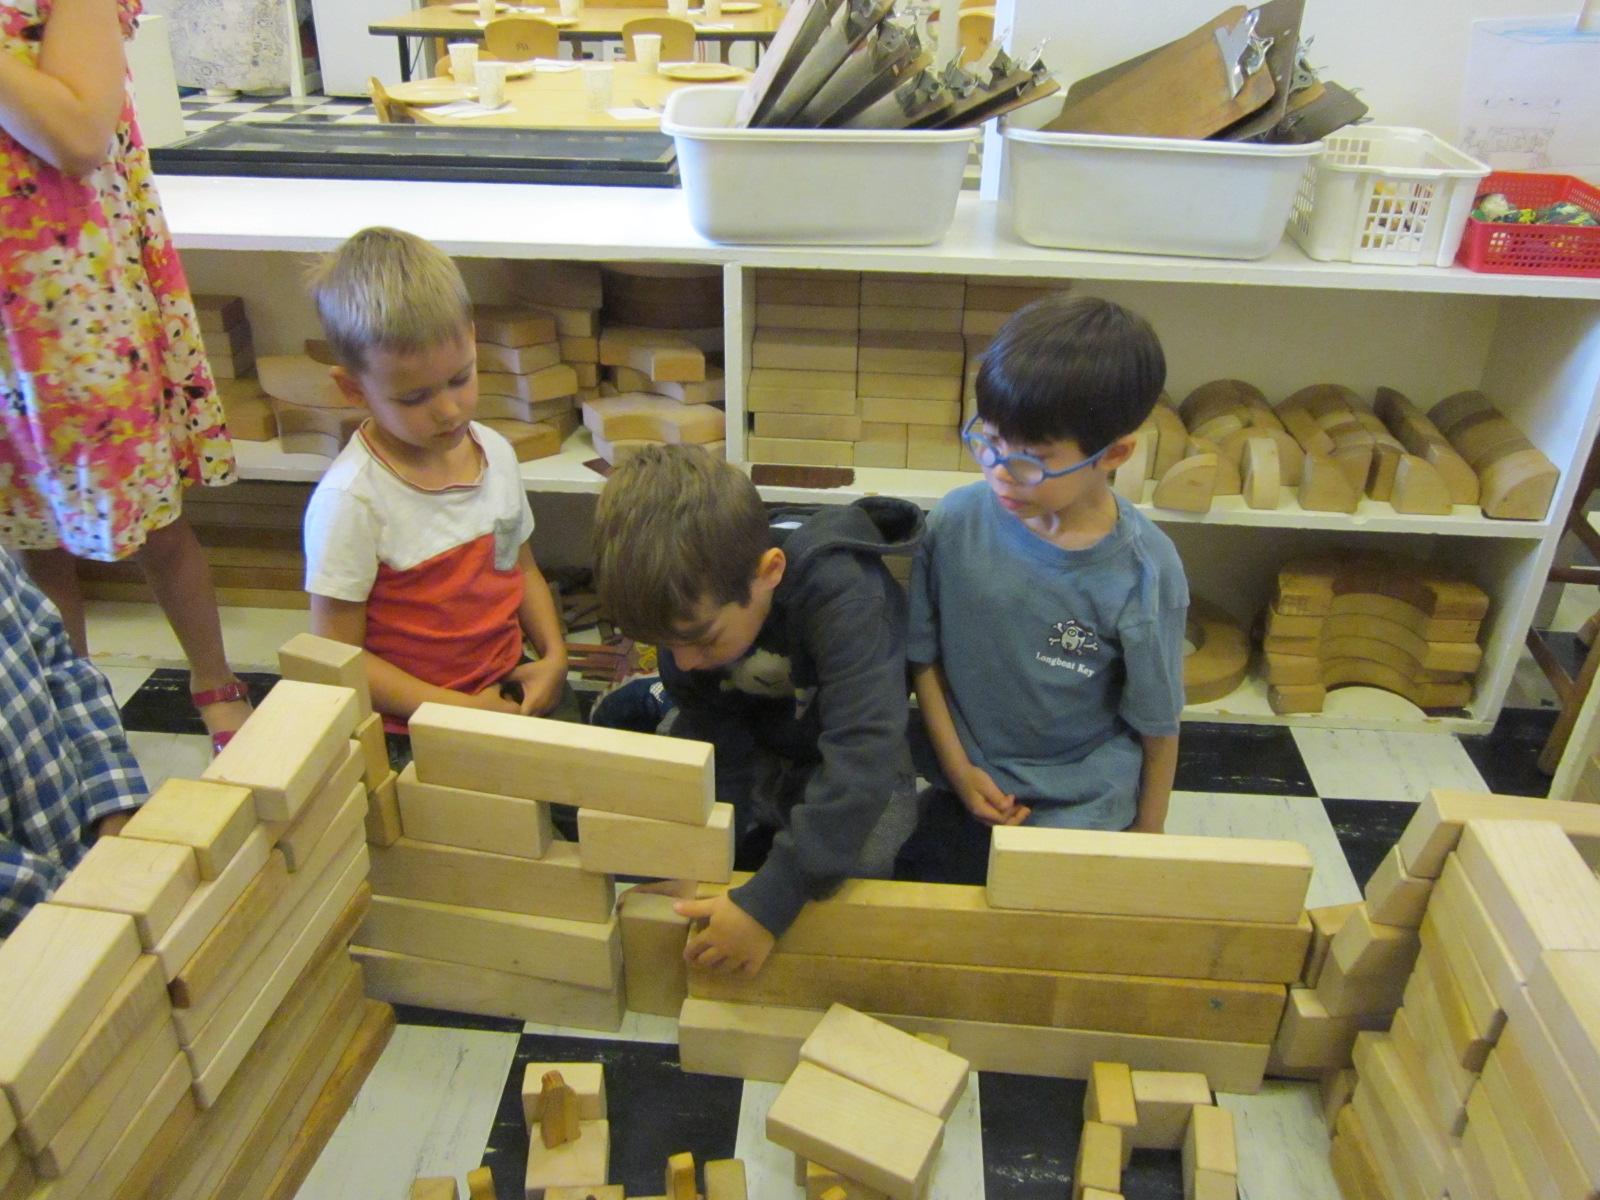 Recreating Store with Blocks.JPG